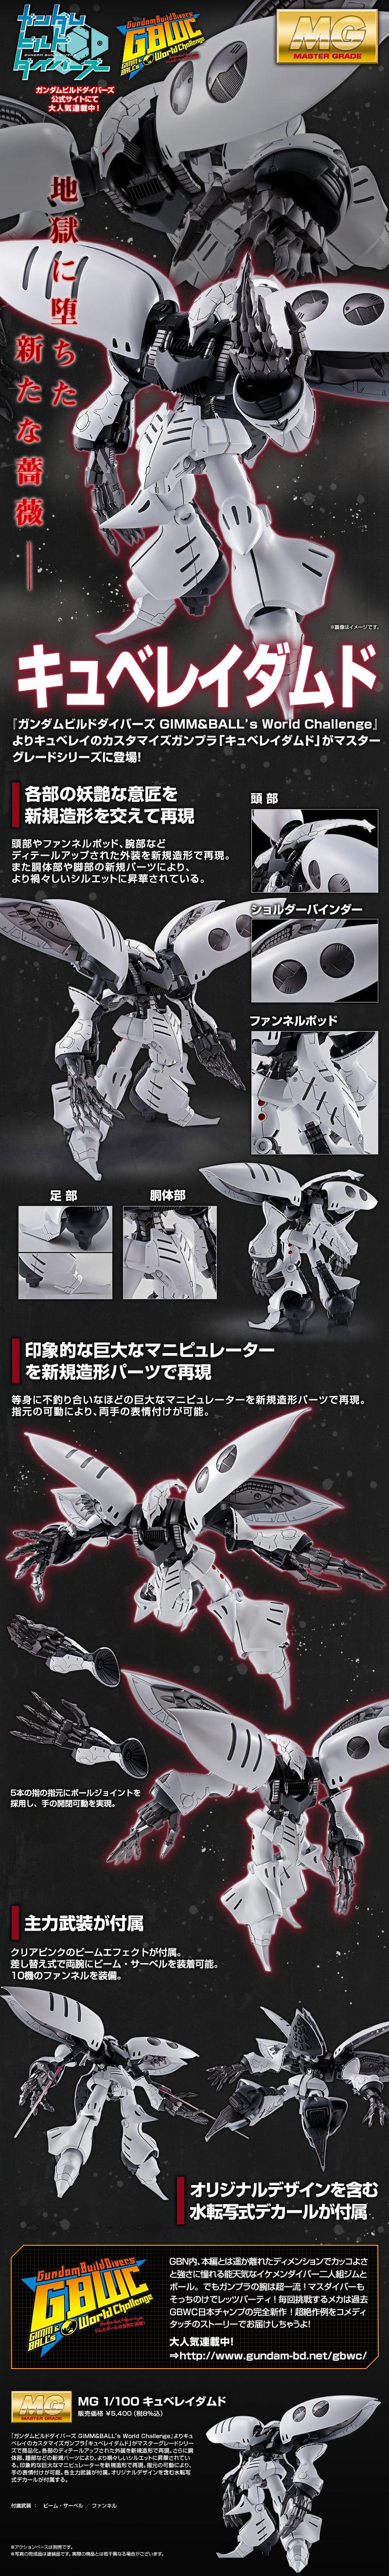 MG 1/100 キュベレイダムド 公式商品説明(画像)